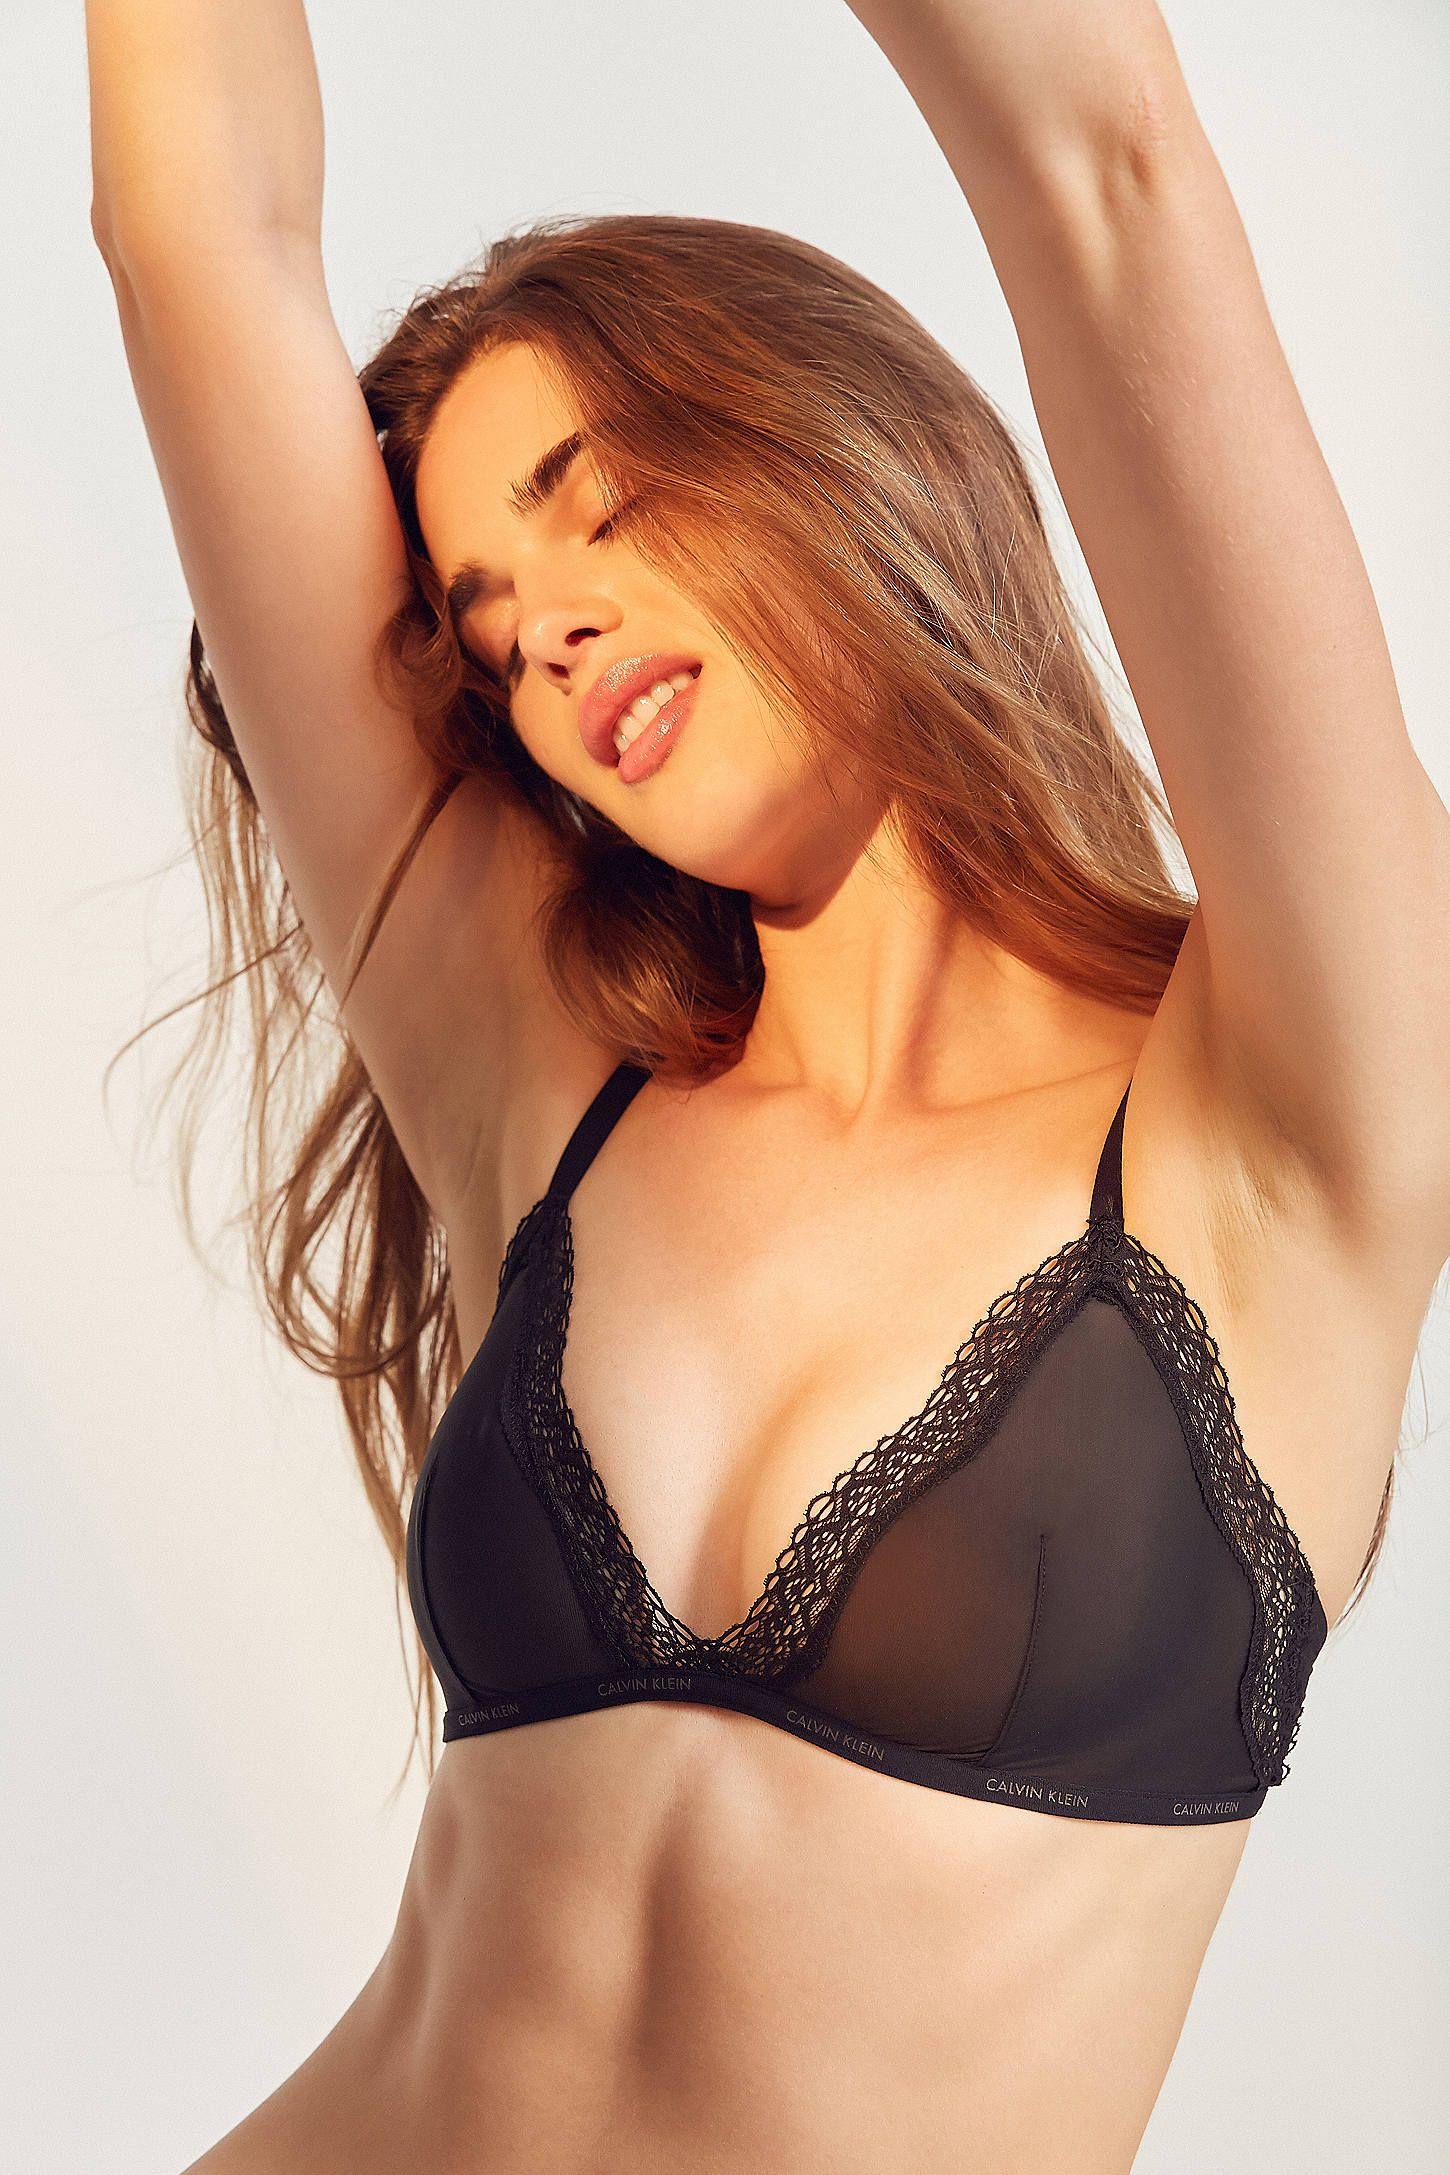 a9d0ff87a9d Calvin klein sheer marquisette lace triangle bra wardrobe nearly jpg  1450x2175 Bra caitlyn wardrobe